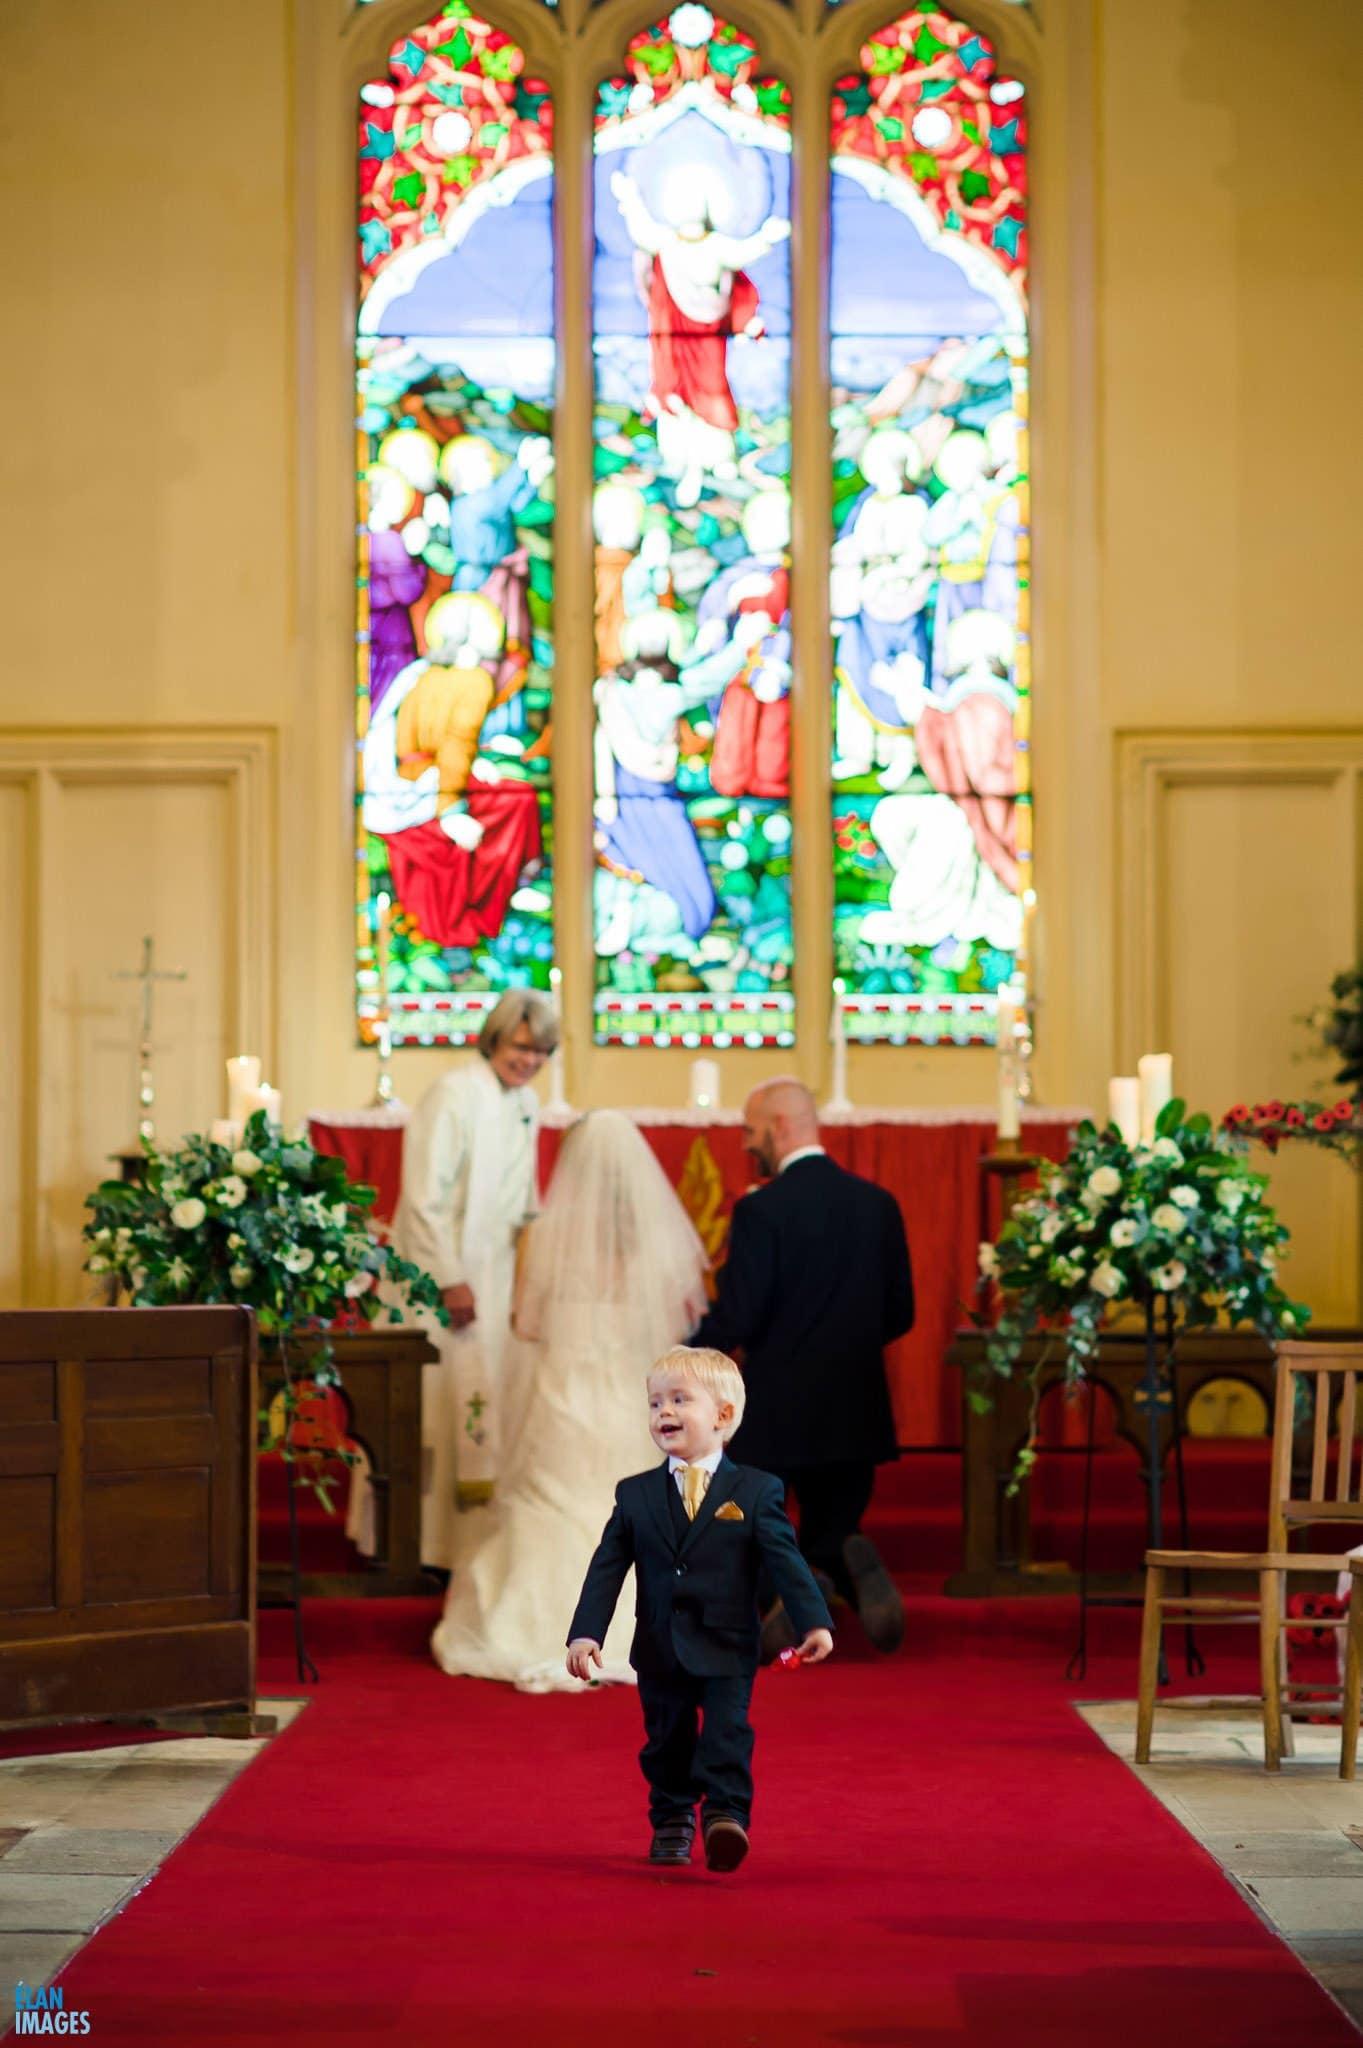 Wedding at leigh park hotel -060